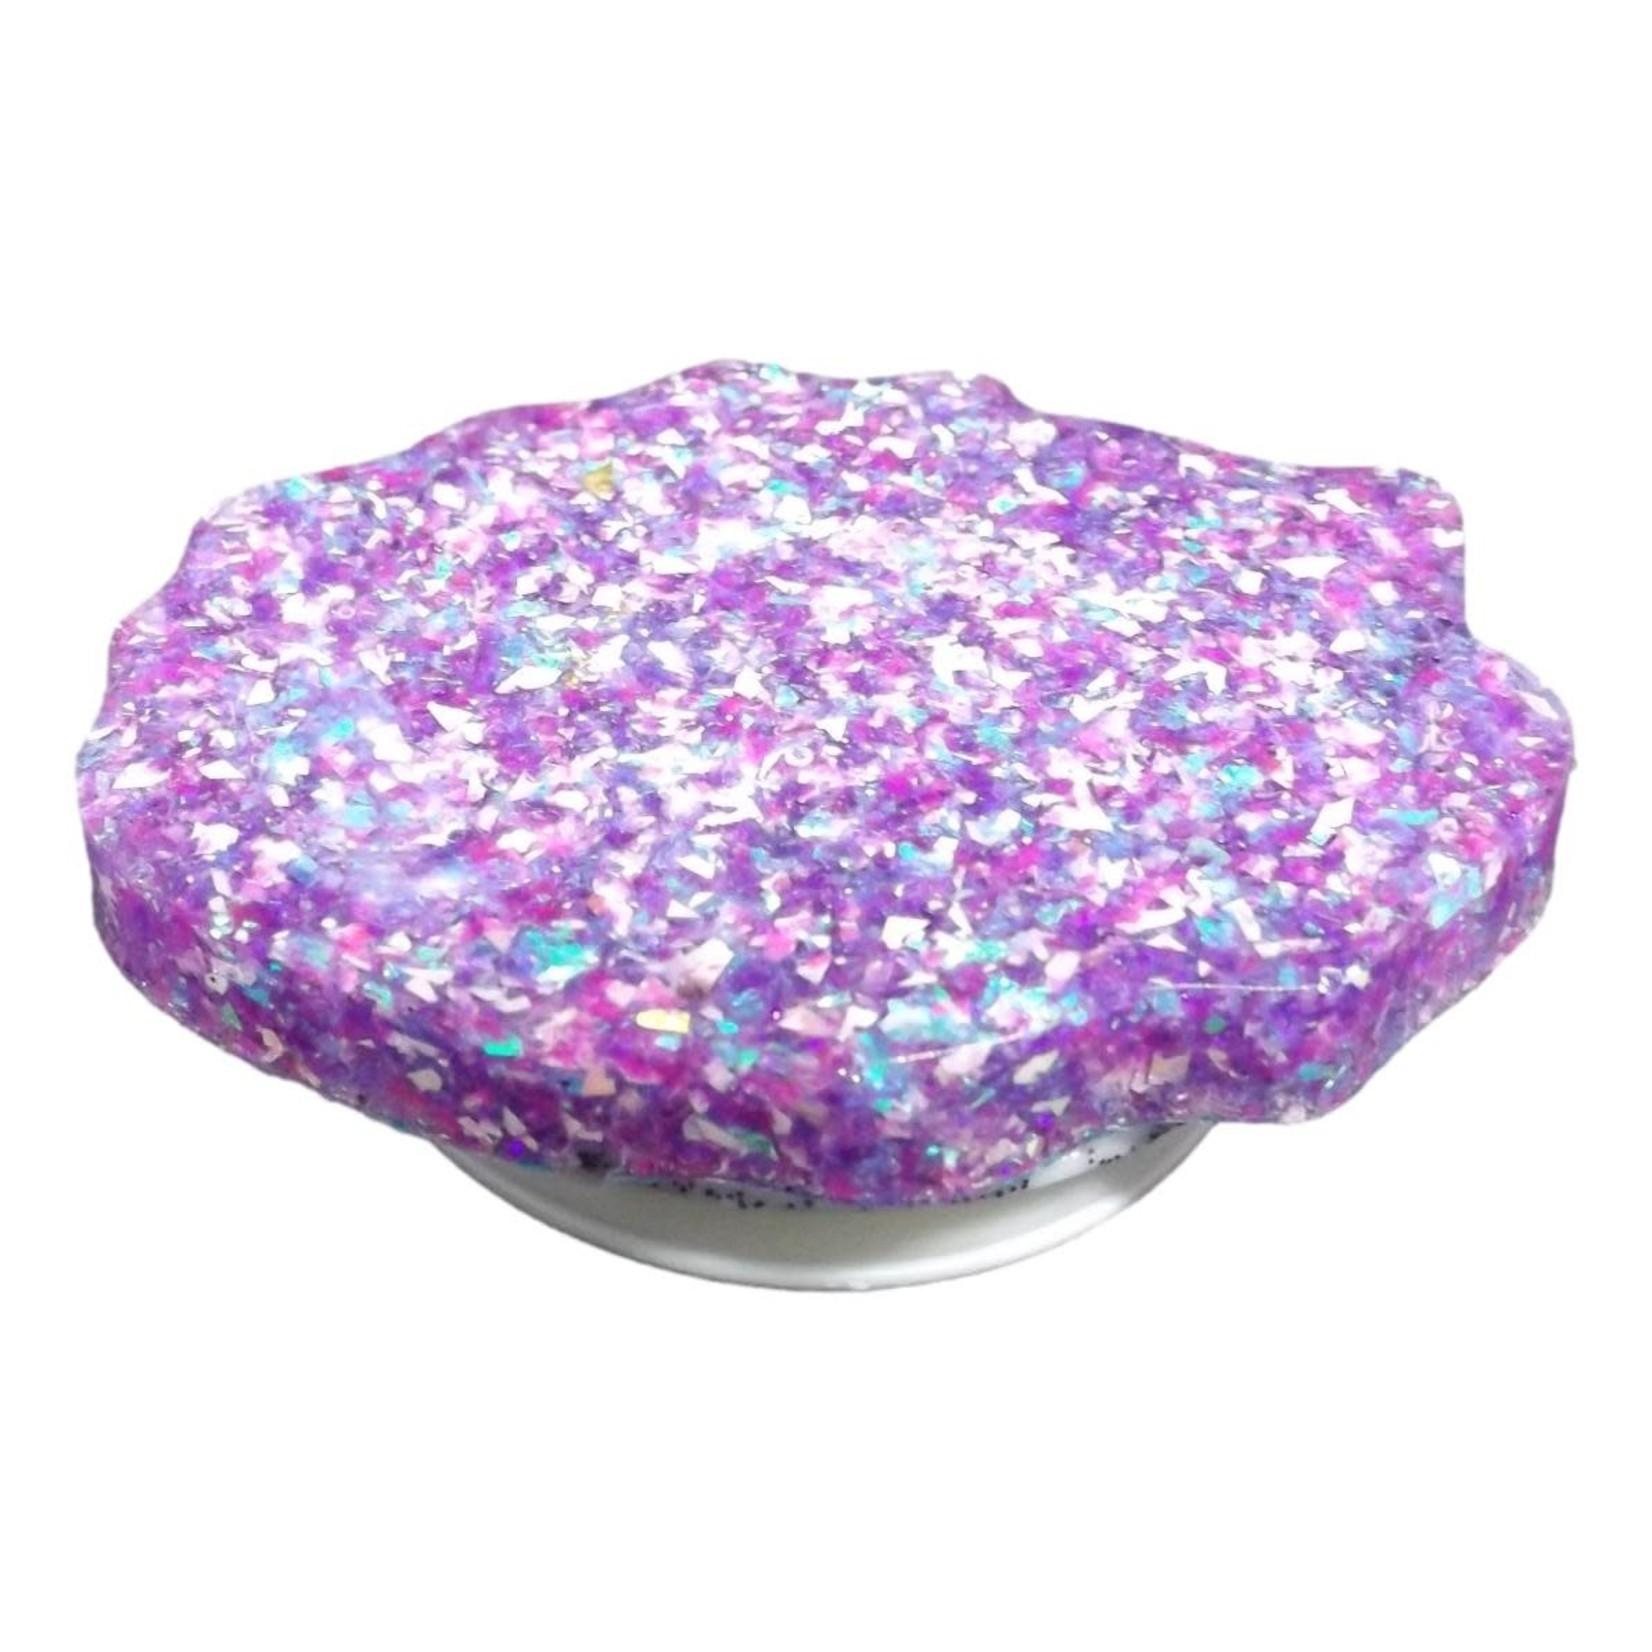 East Coast Sirens Sparkling Purple Geode-style Phone Grip